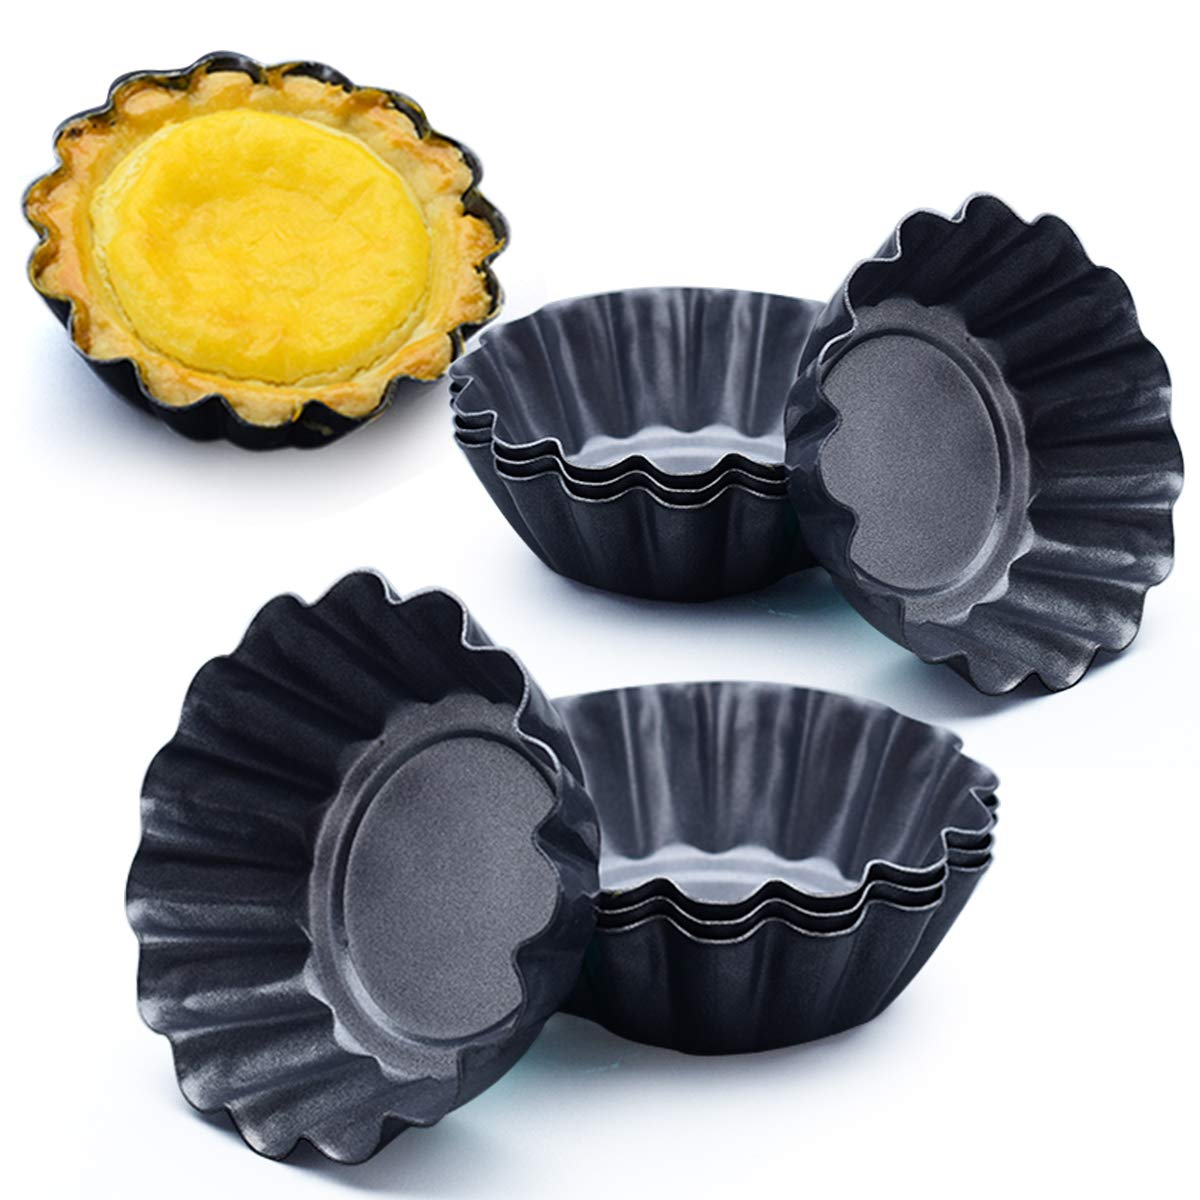 Amytalk 12 Packs Egg Tart Mold, Upgrade Bigger Size 3 x 0.9inch, Cupcake Cake Muffin Mold Tin Pan Baking Tool, Carbon Steel by Amytalk